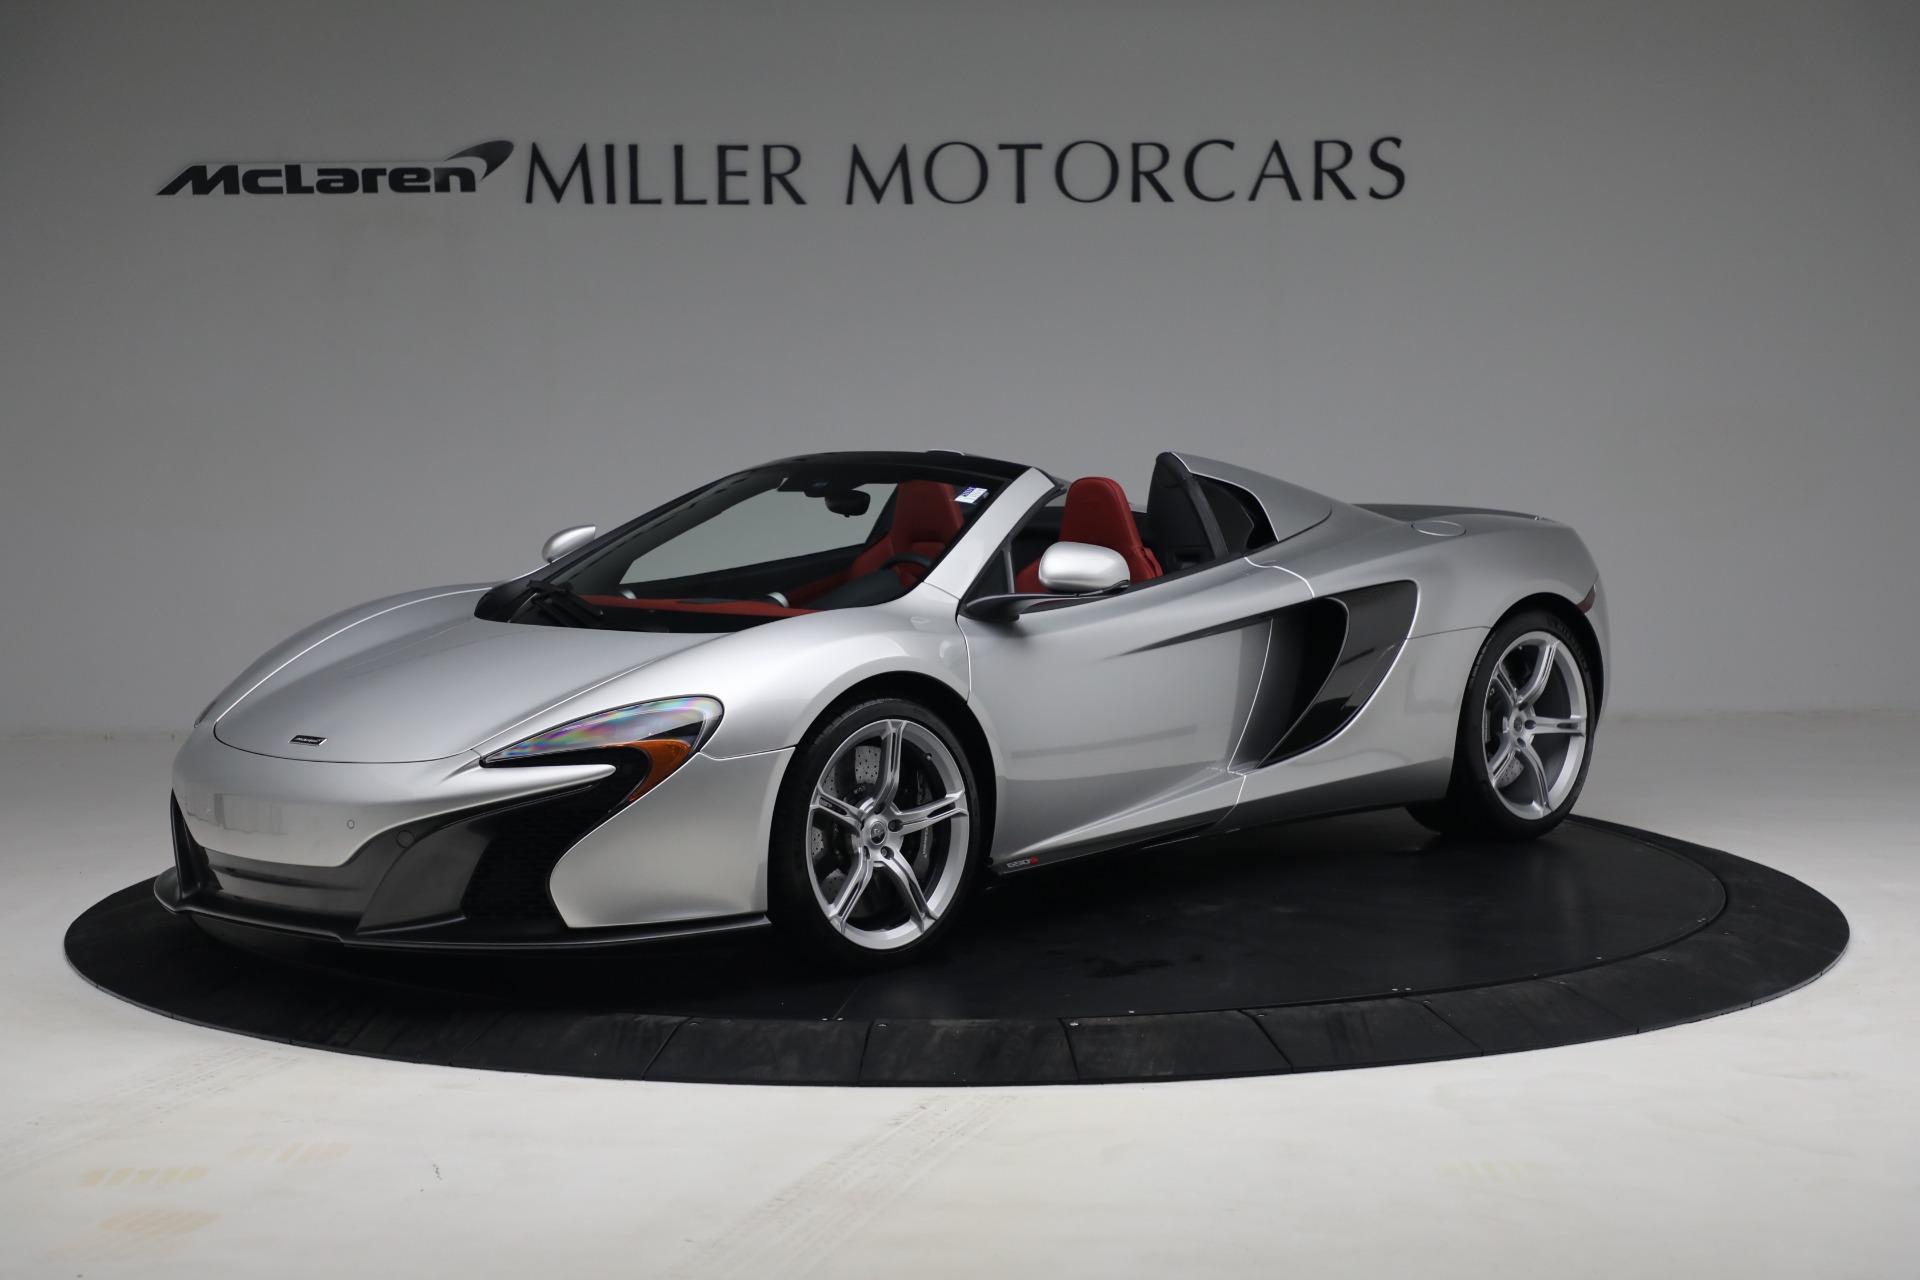 Used 2015 McLaren 650S Spider for sale $179,990 at Maserati of Westport in Westport CT 06880 1